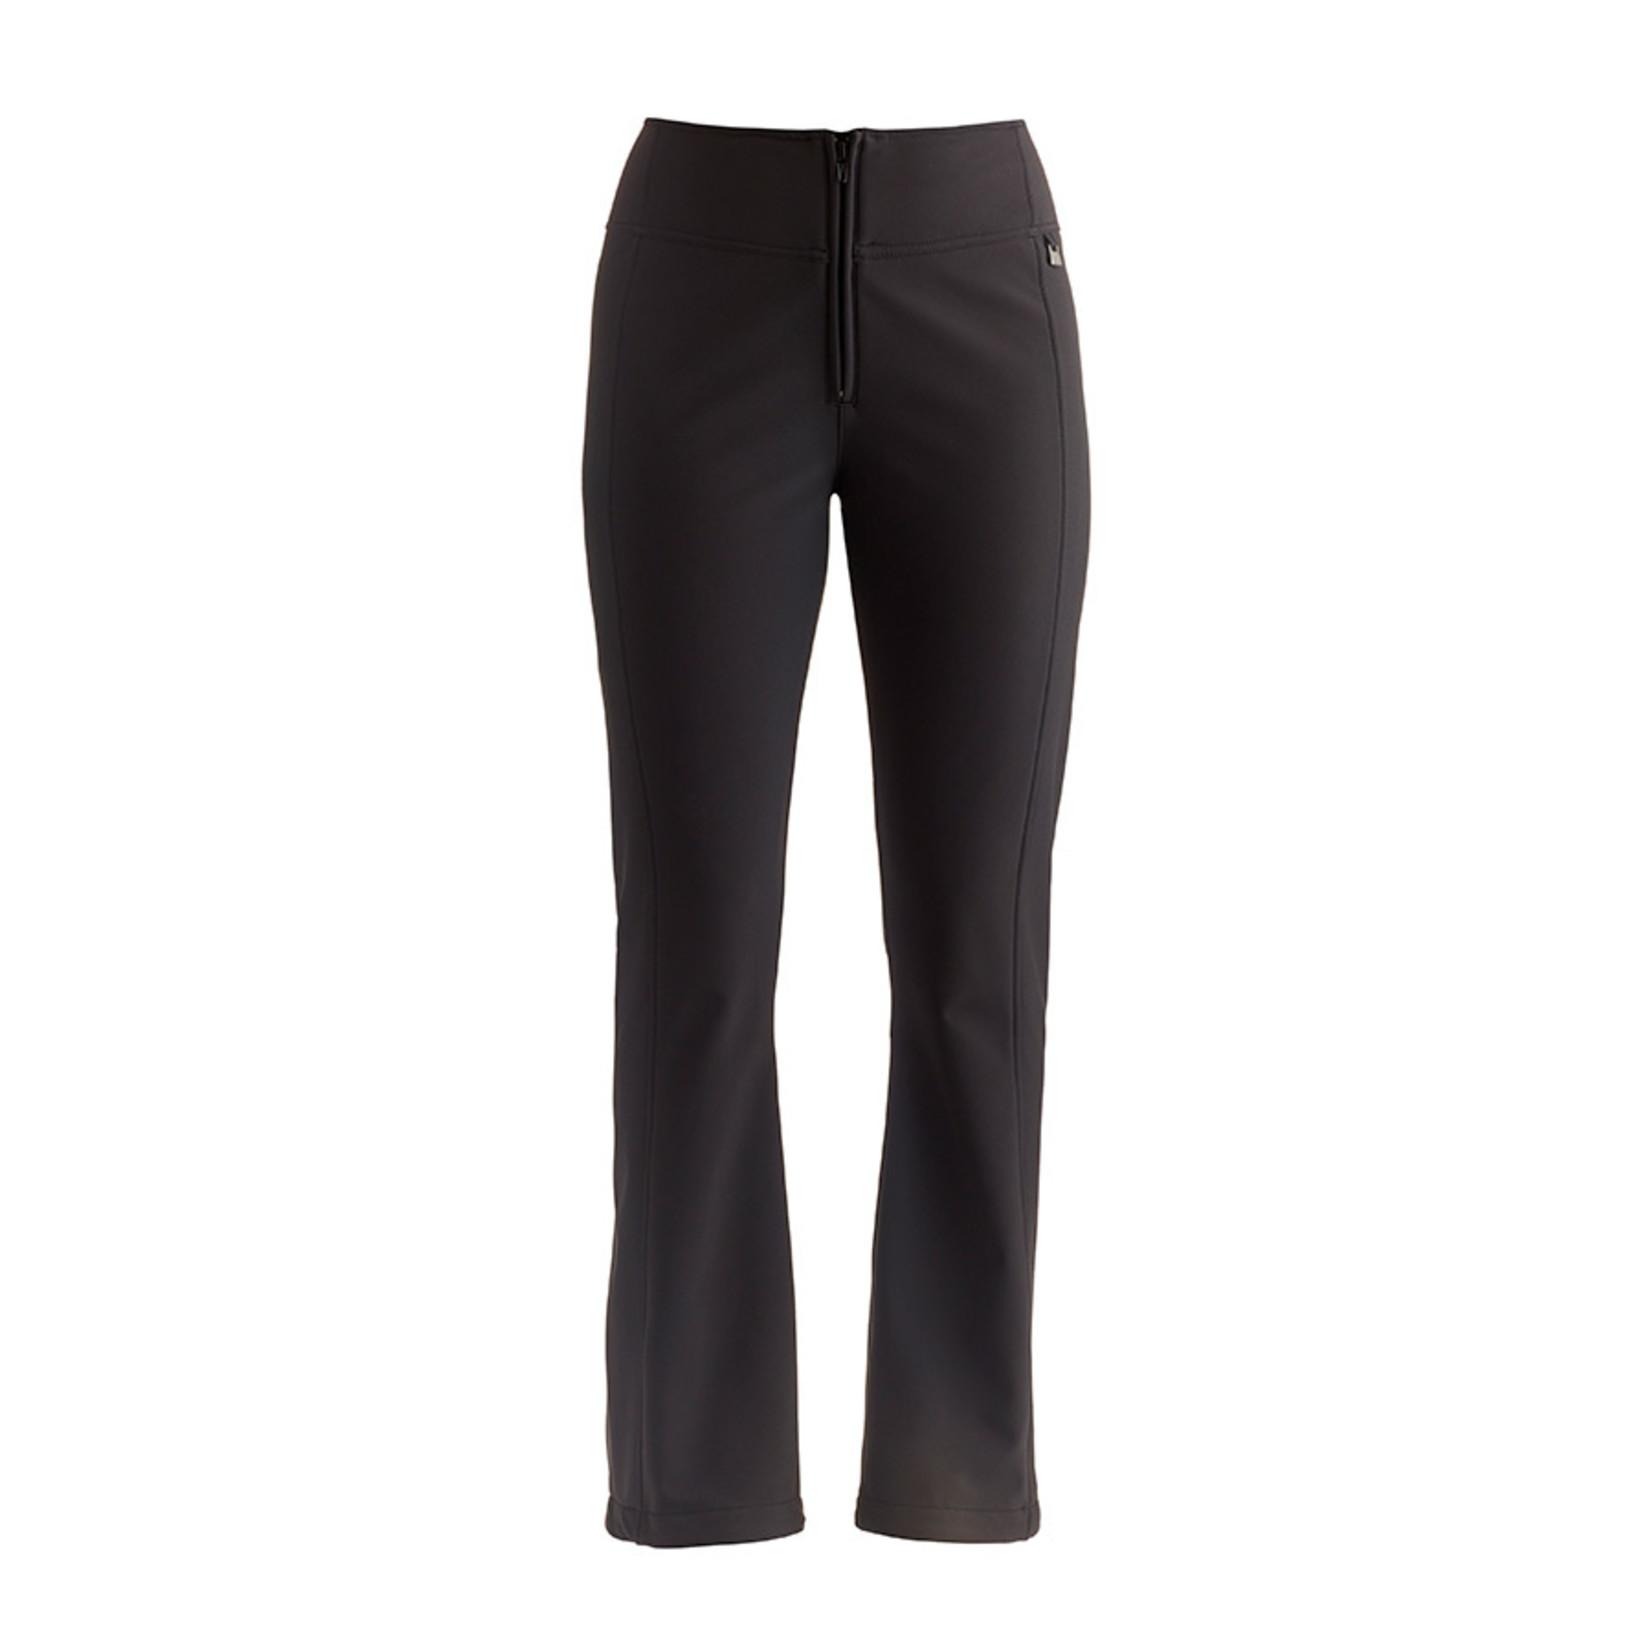 NILS NILS Jamie Women's Pant